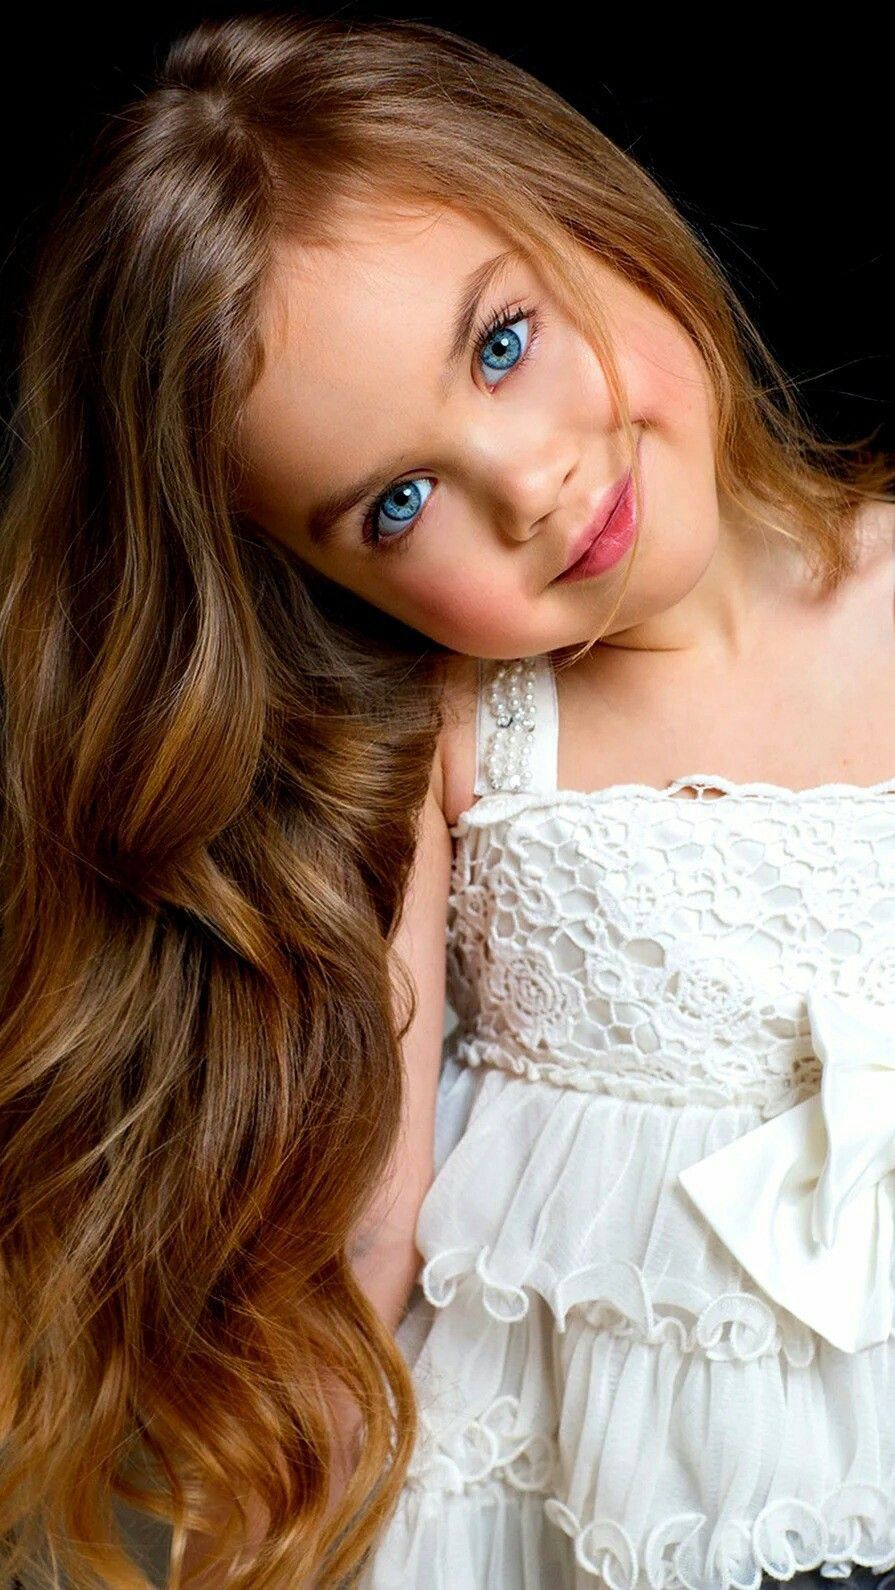 Pin By M Hulshof On Cute Baby Girl Blue Eyes Beautiful Little Girls Beautiful Children